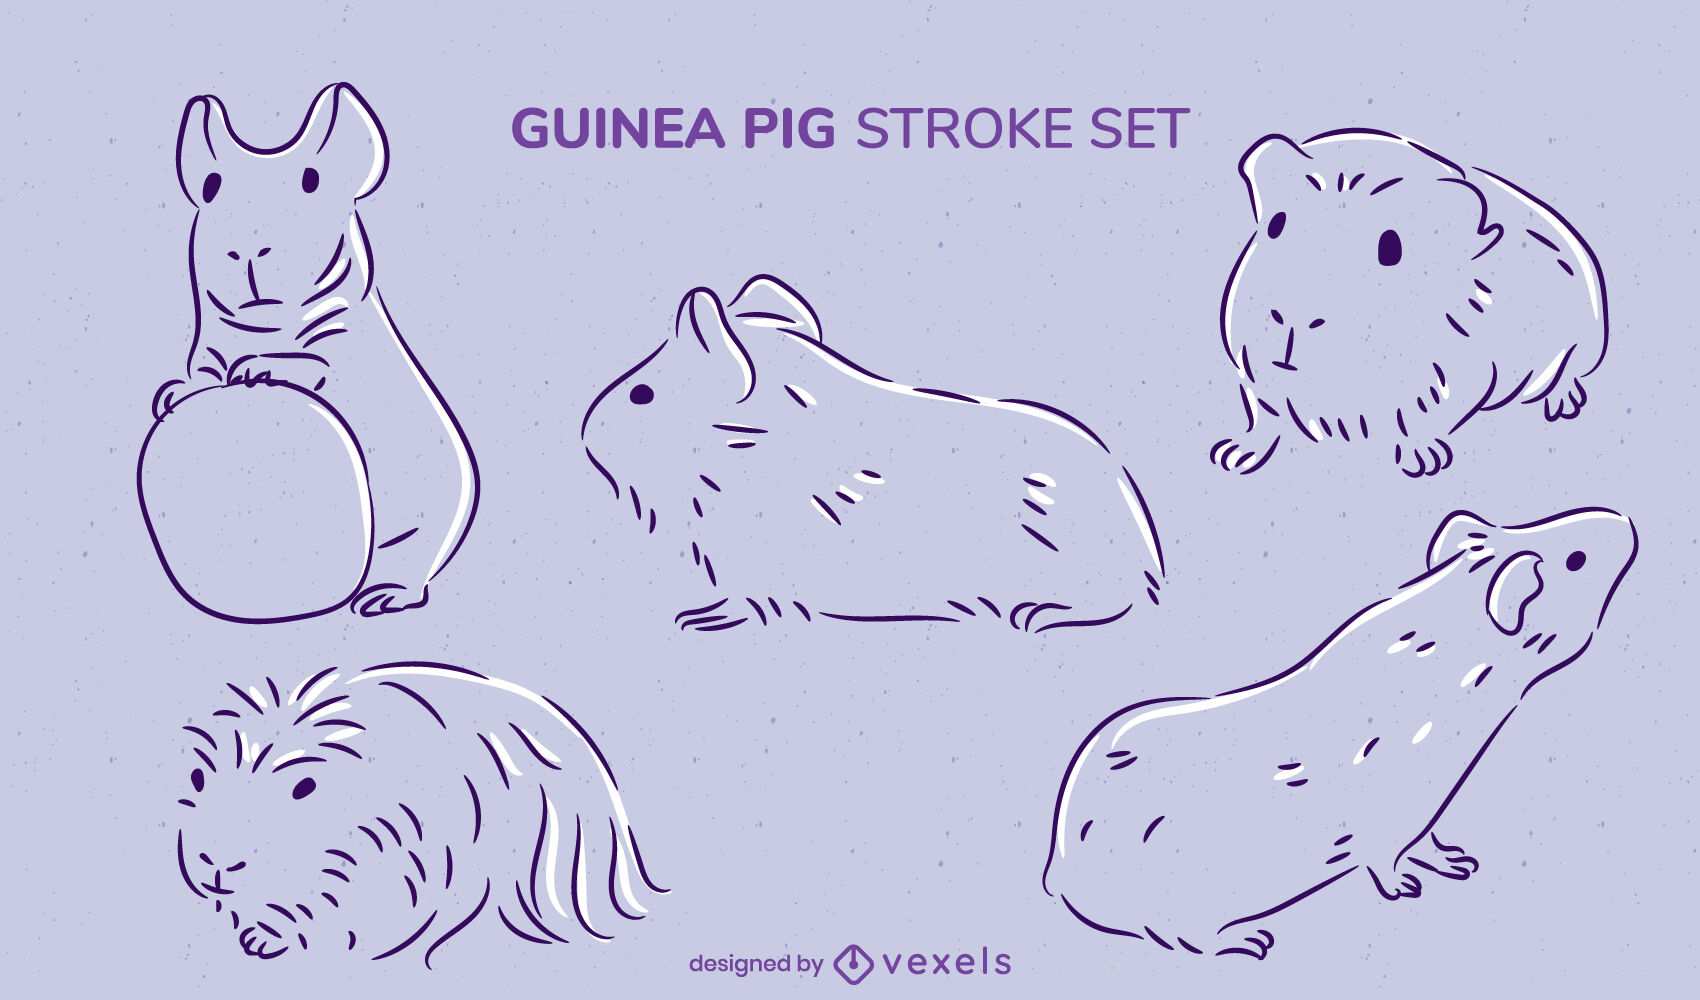 Guinea pigs rodent animal stroke set